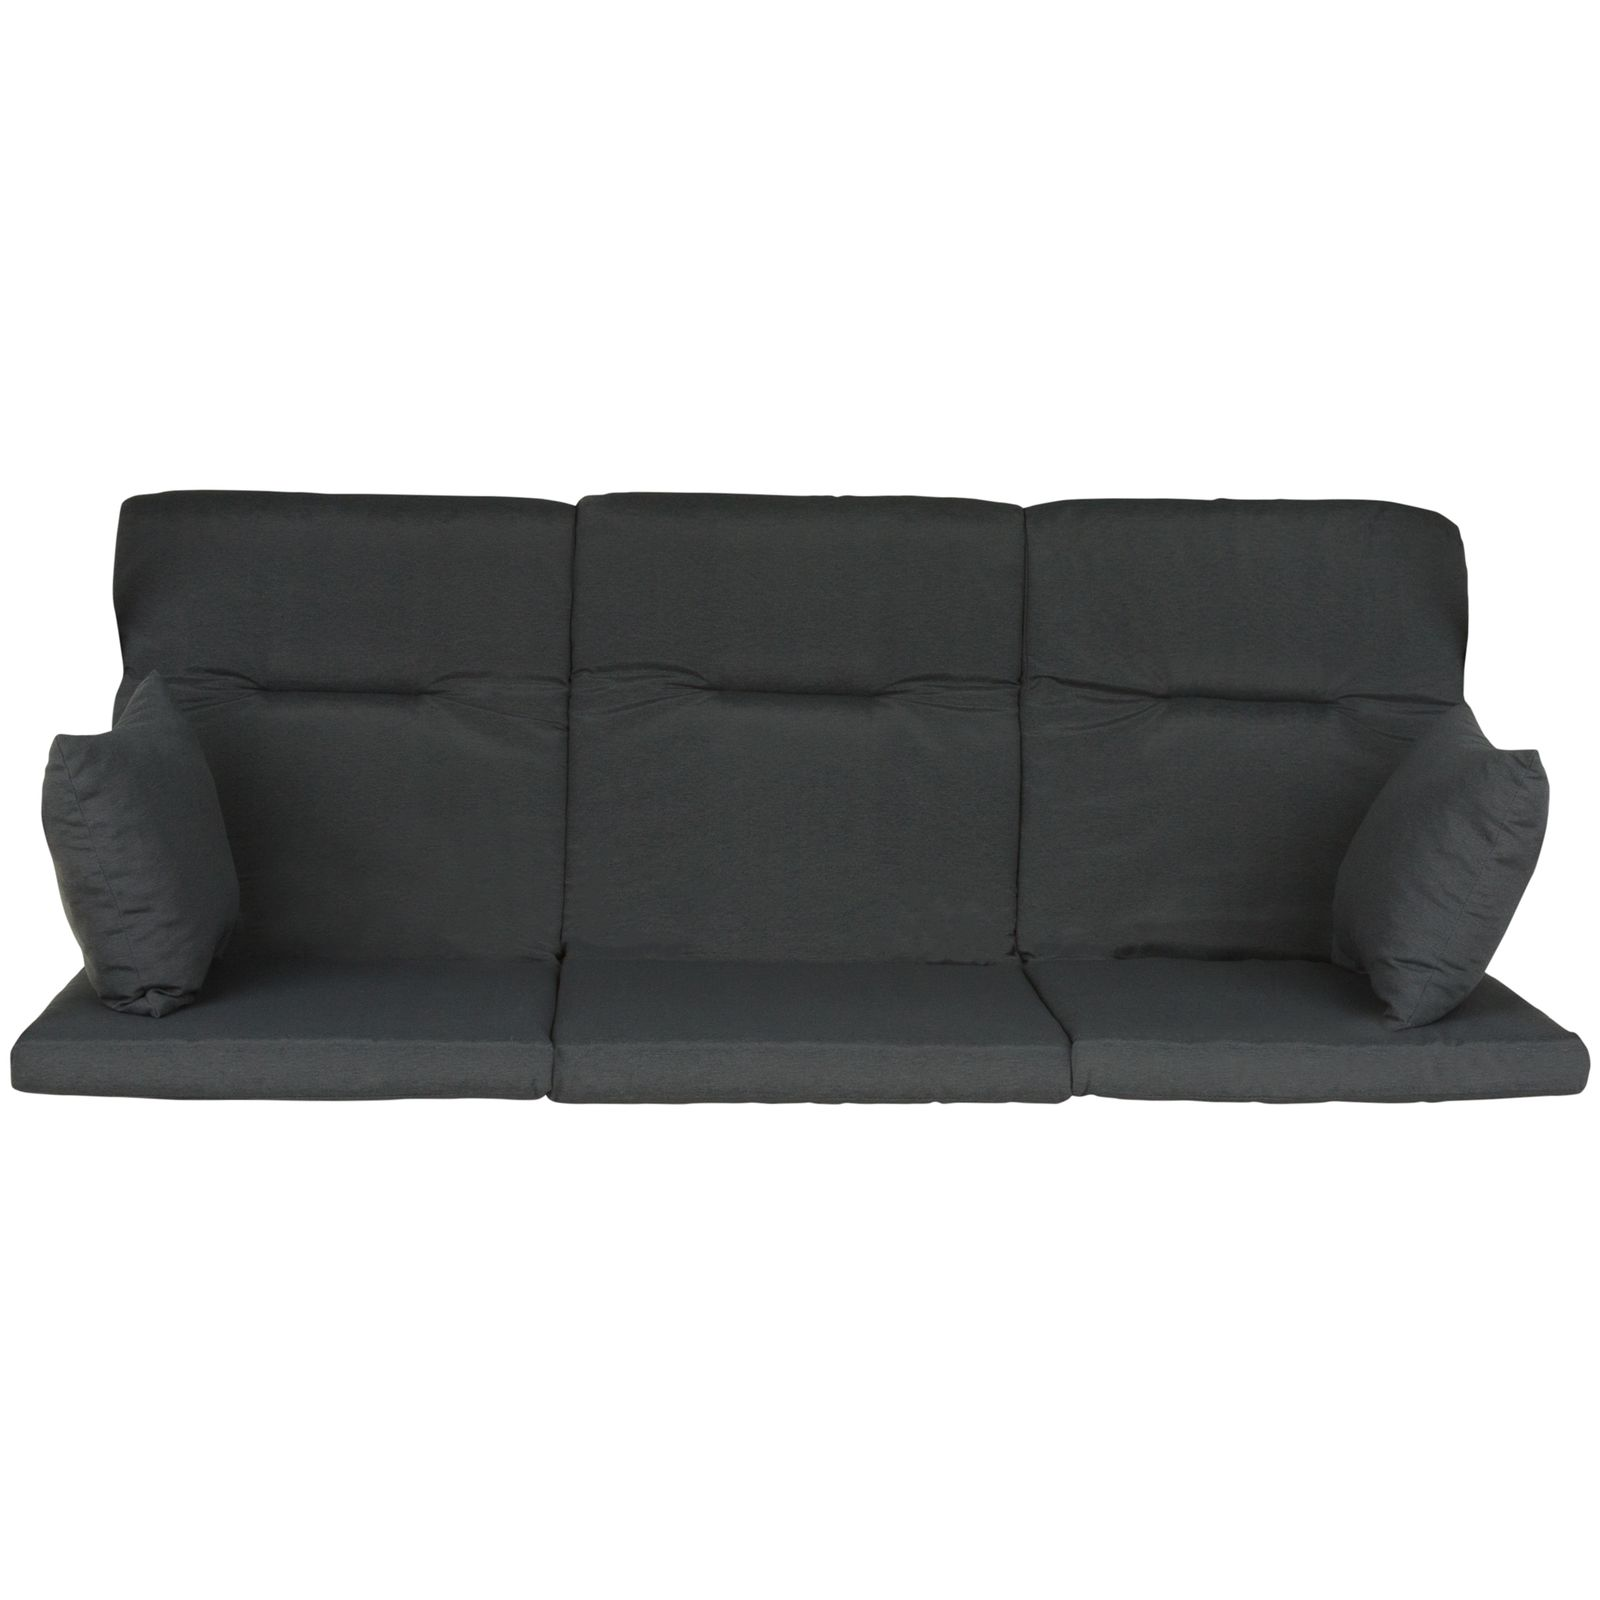 Profilowane poduszki na huśtawkę 180 cm Rimini / Venezia (Bresso) D002-06LB PATIO